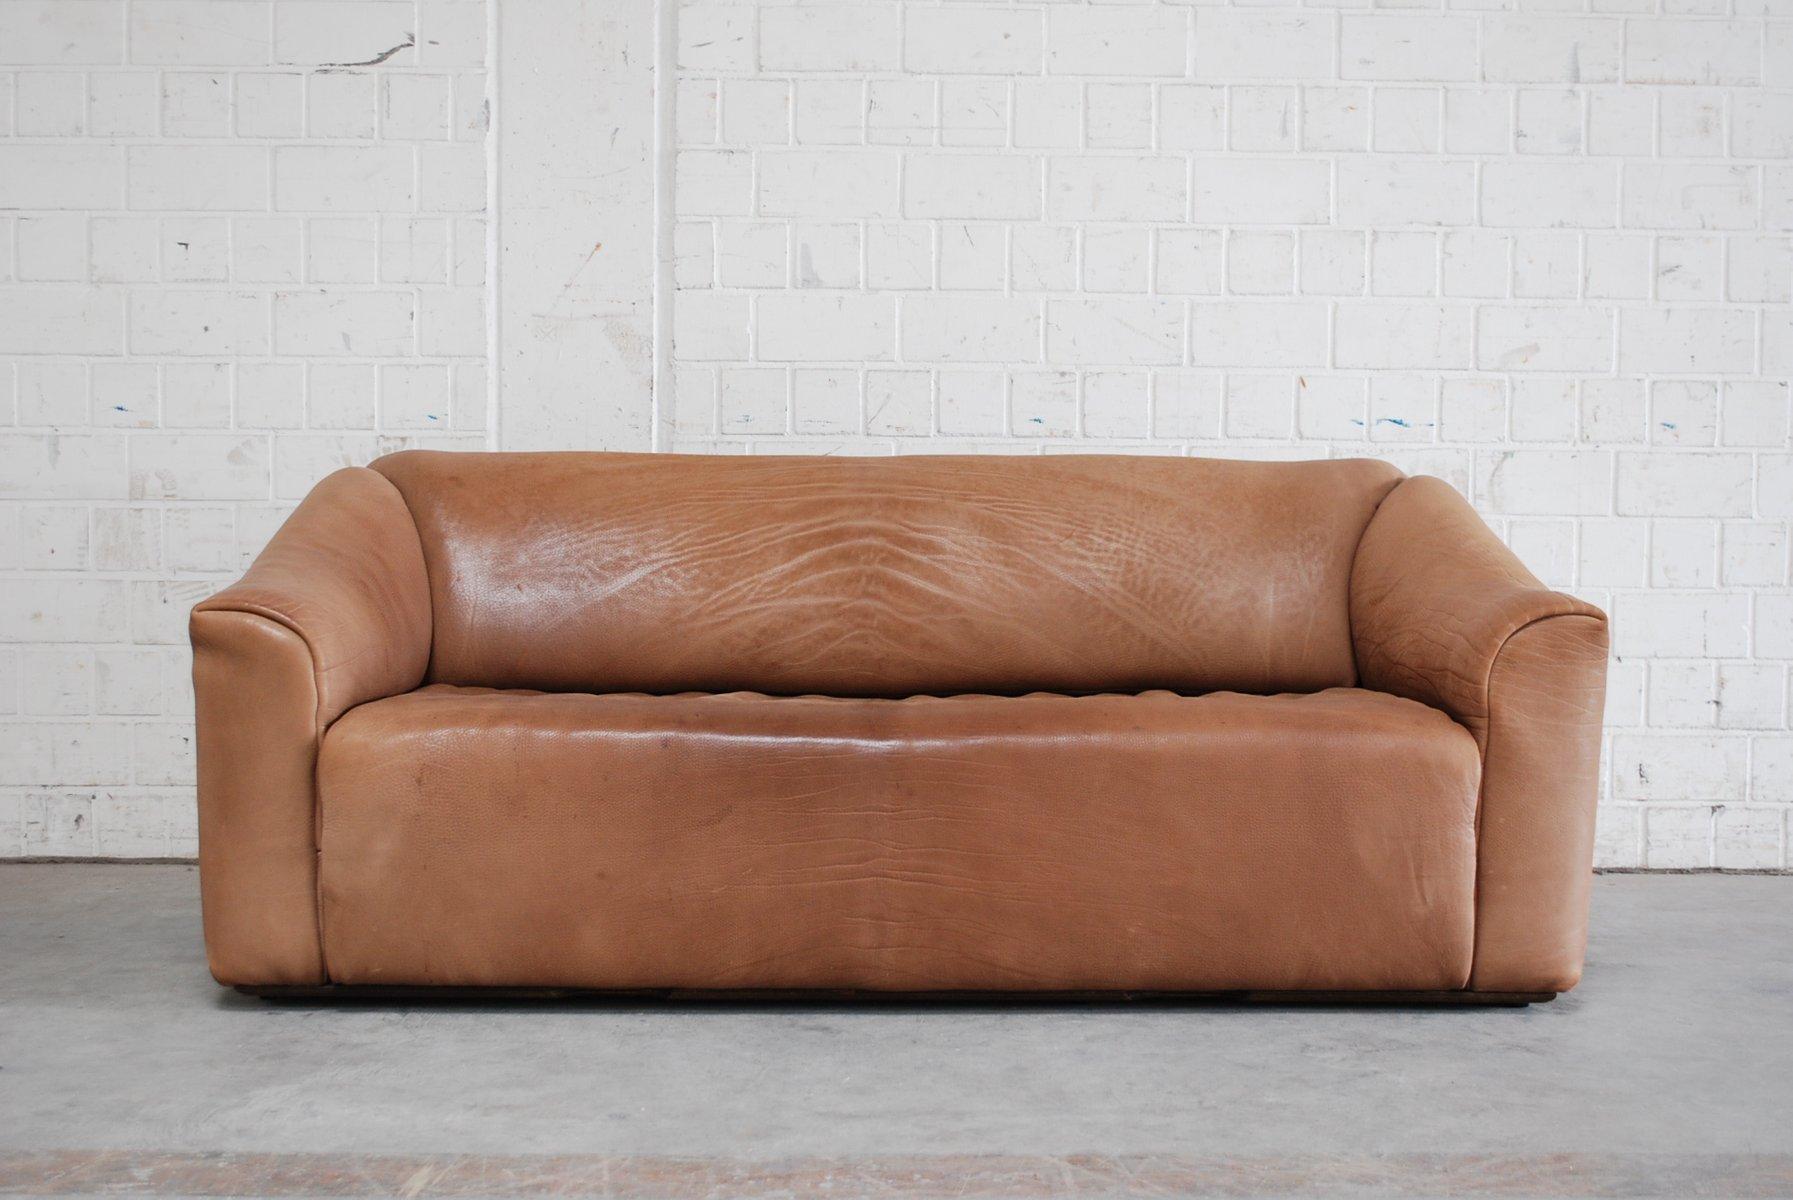 Vintage DS-47 Drei-Sitzer Ledersofa in Cognacfarben von de Sede